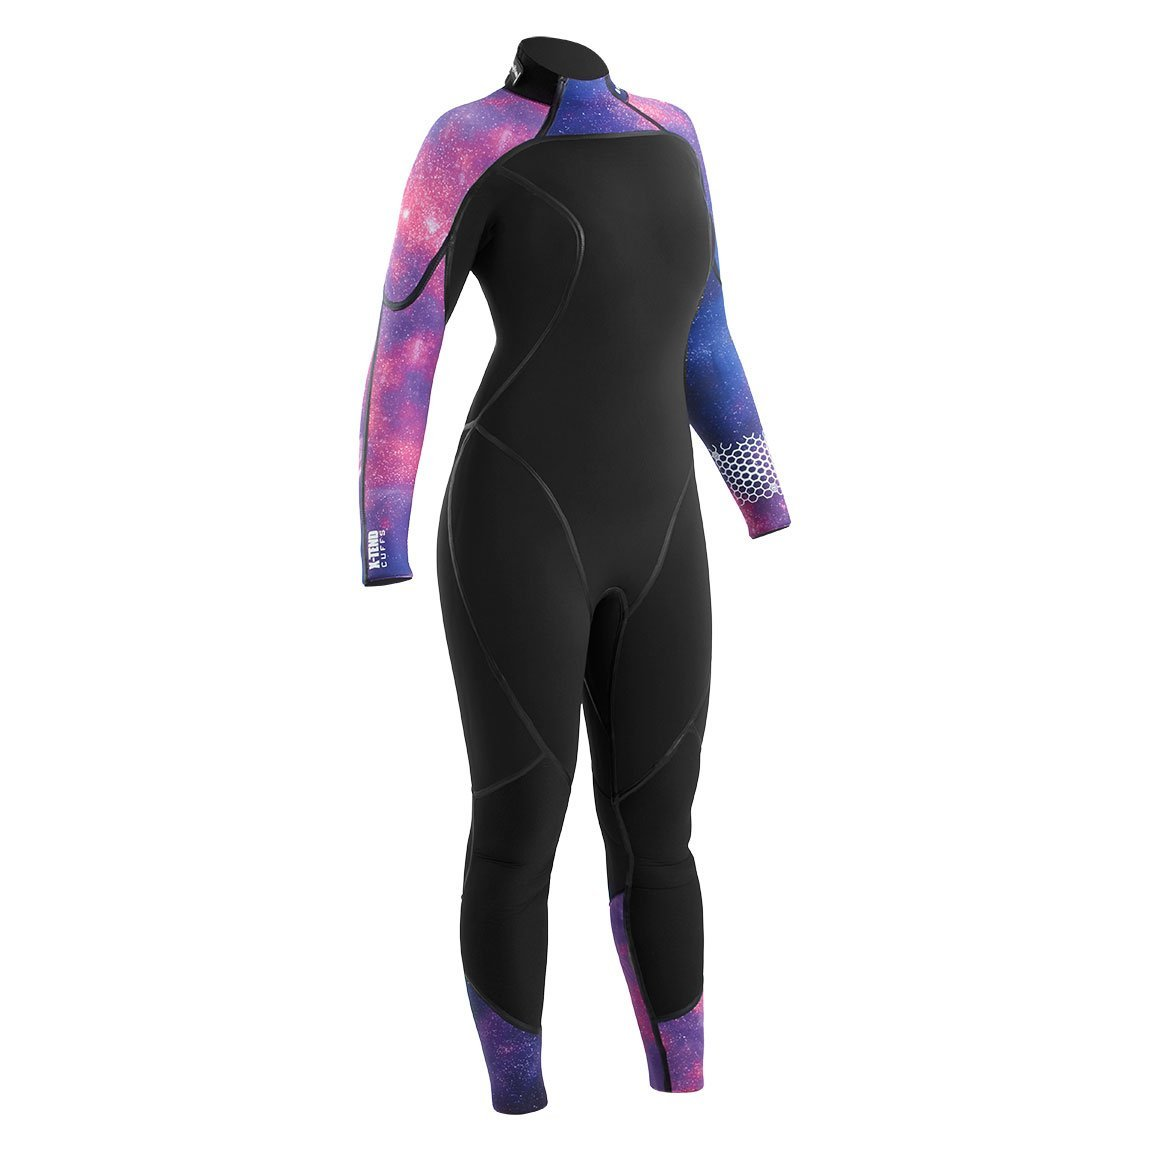 Wetsuit 7mm Aquaflex Women's Galaxy/Black